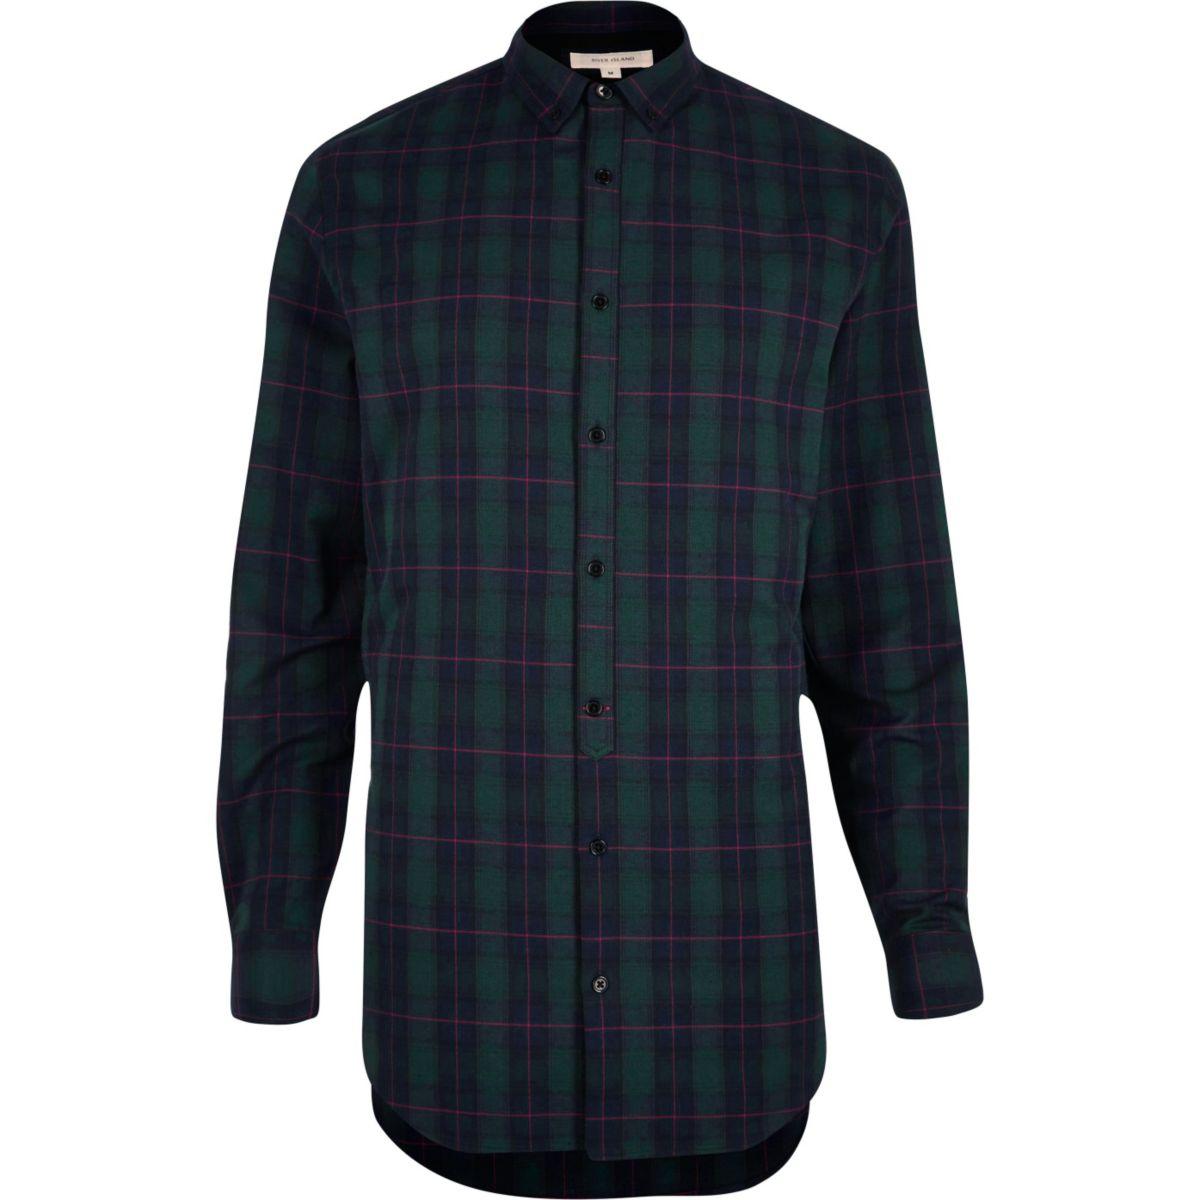 Green longline check shirt